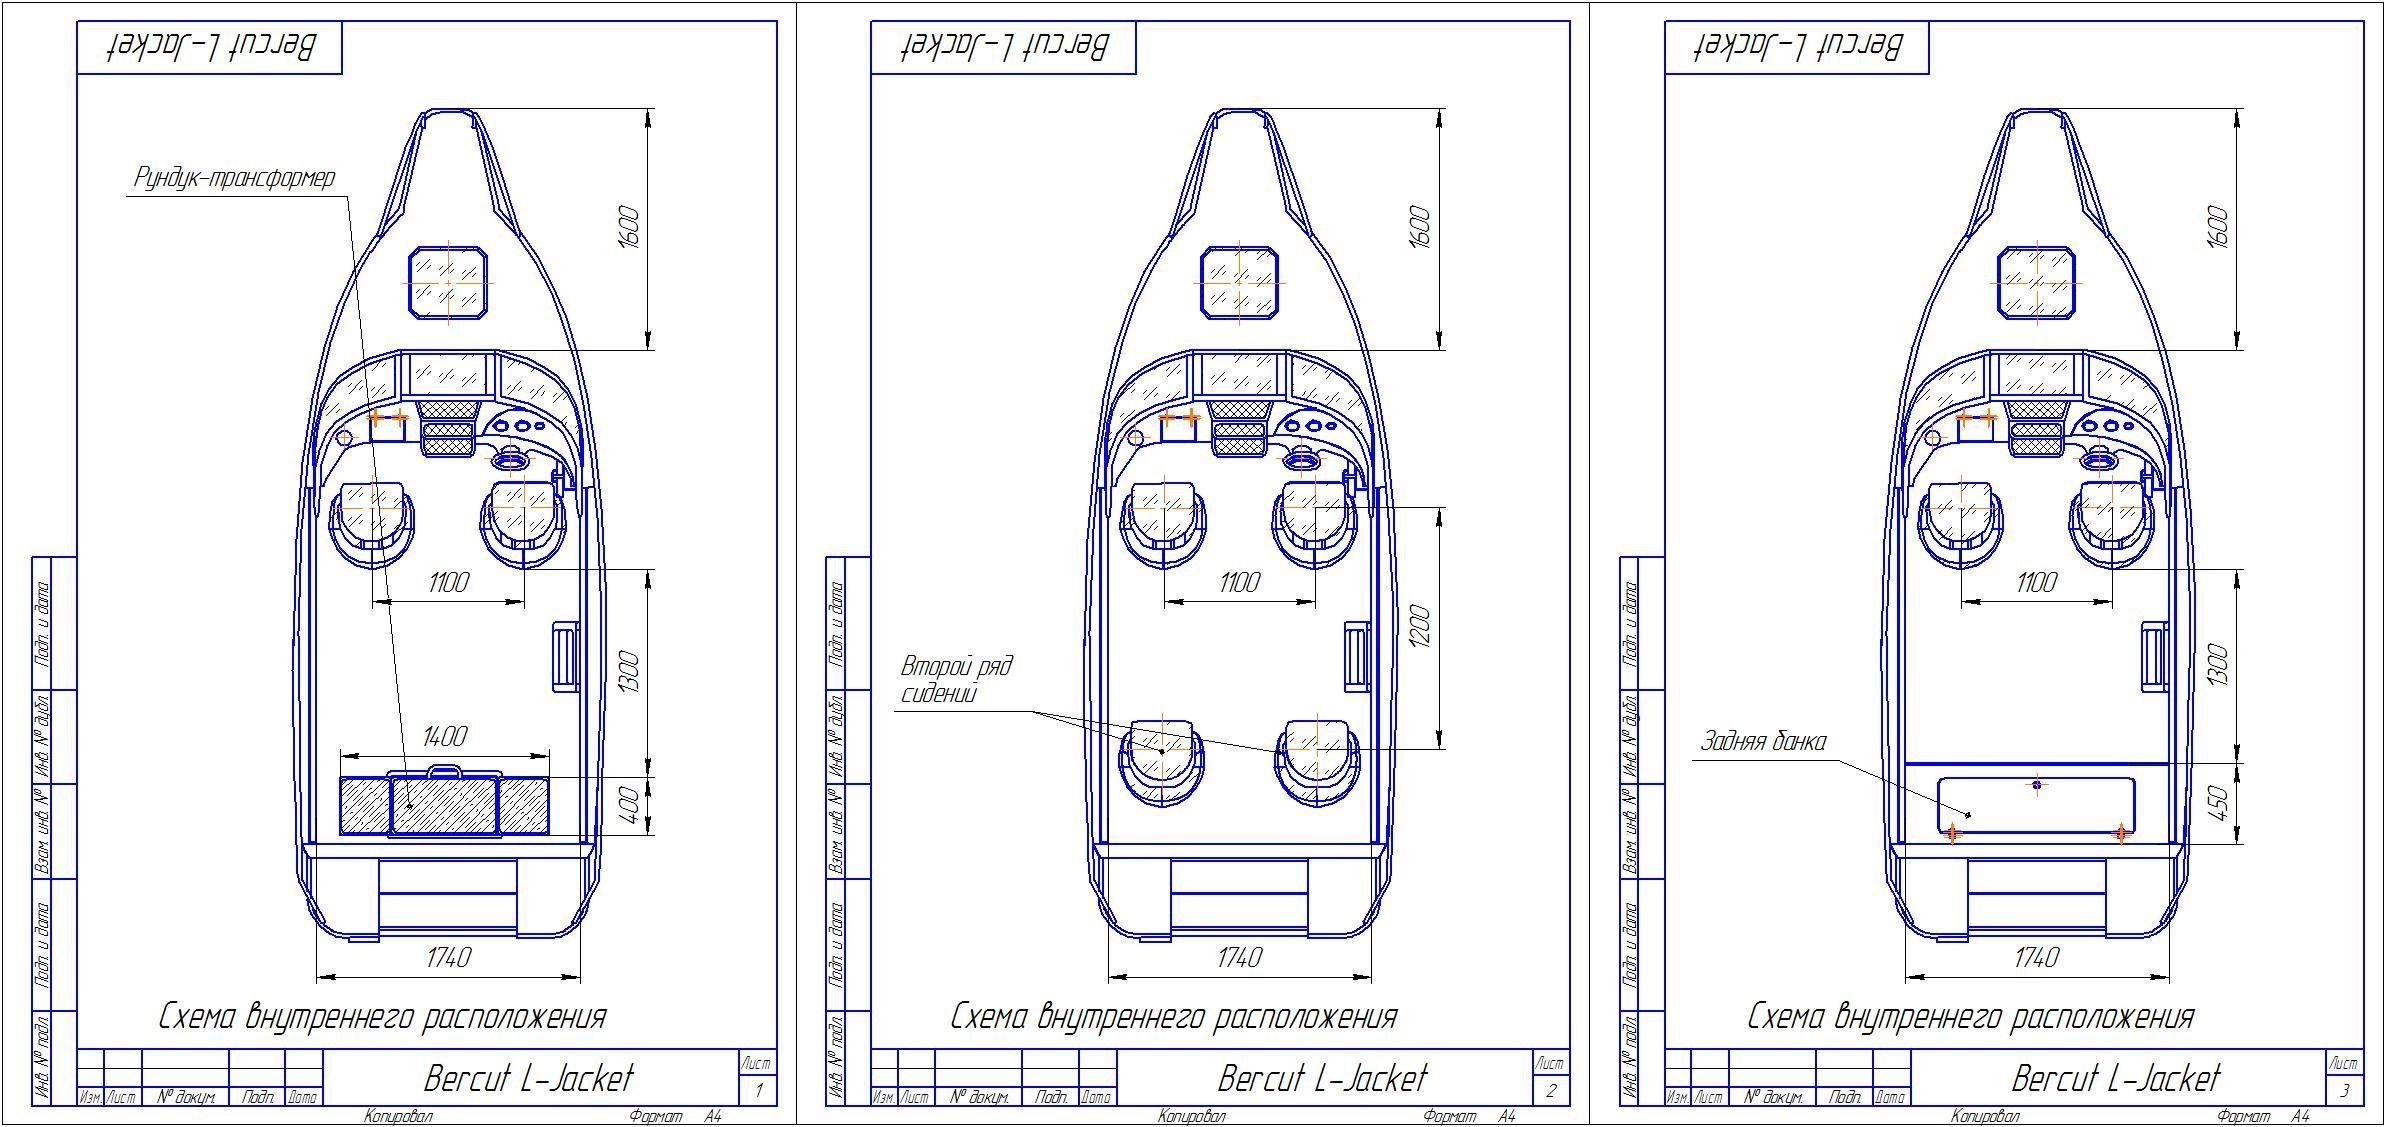 схема установка рулевого механизма на моторную лодку